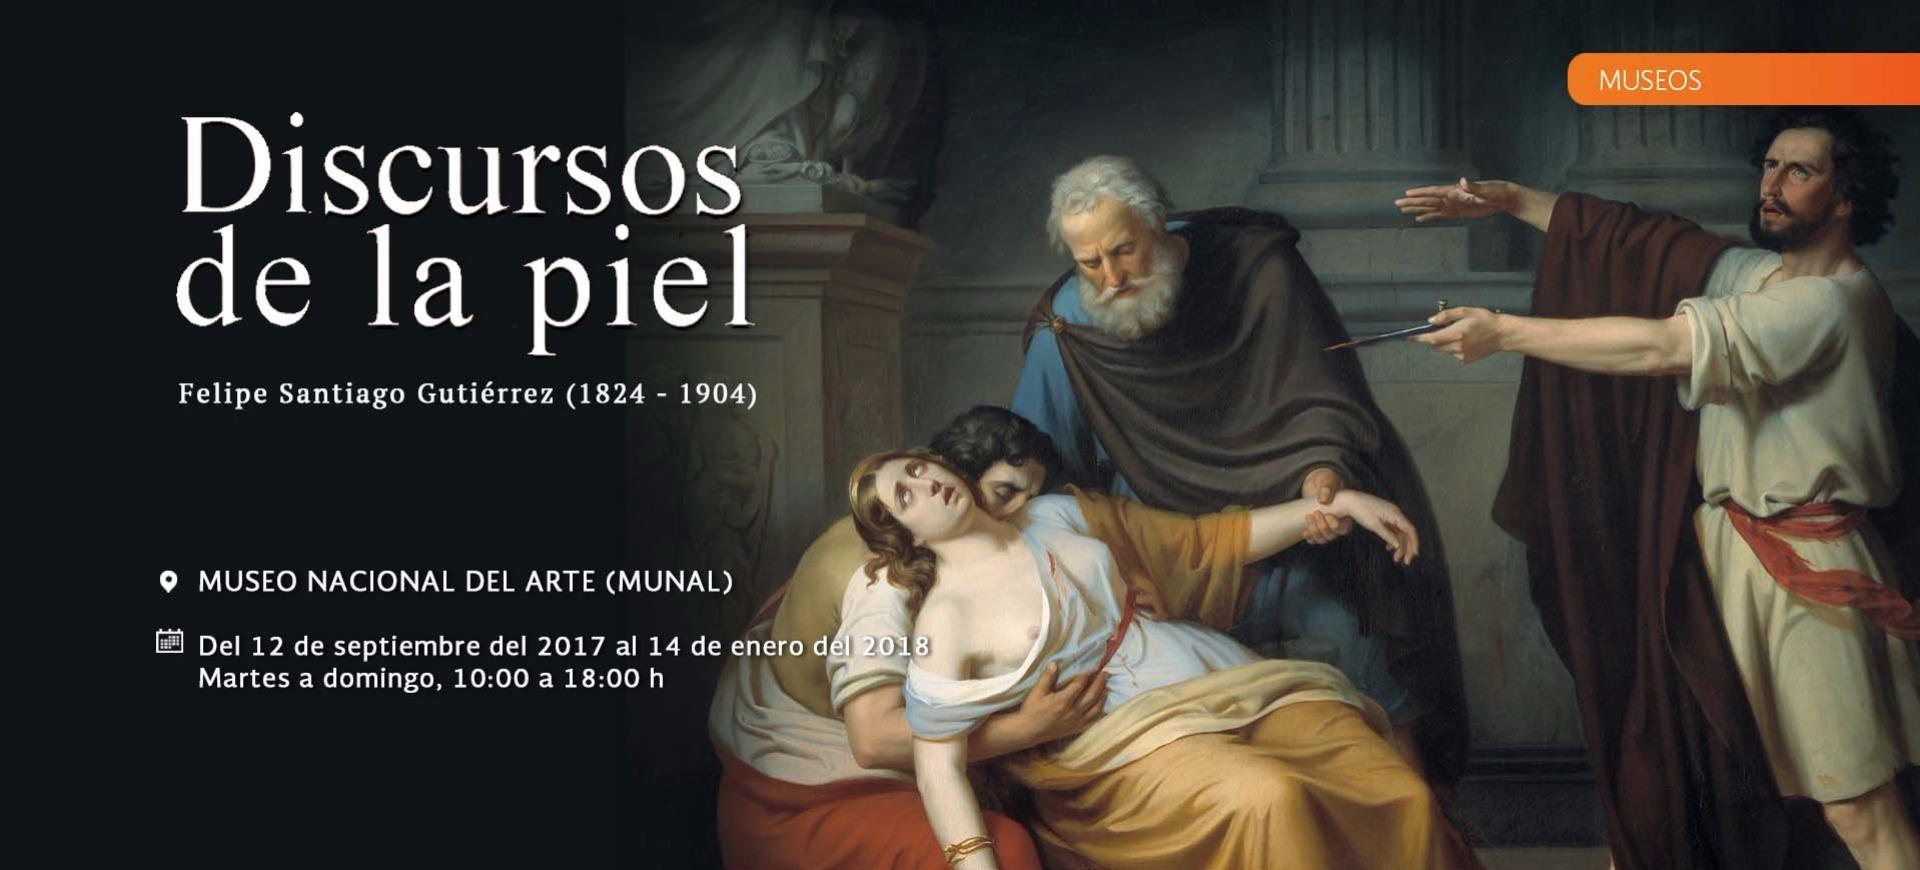 Discursos de la piel. Felipe Santiago Gutiérrez (1824-1904)